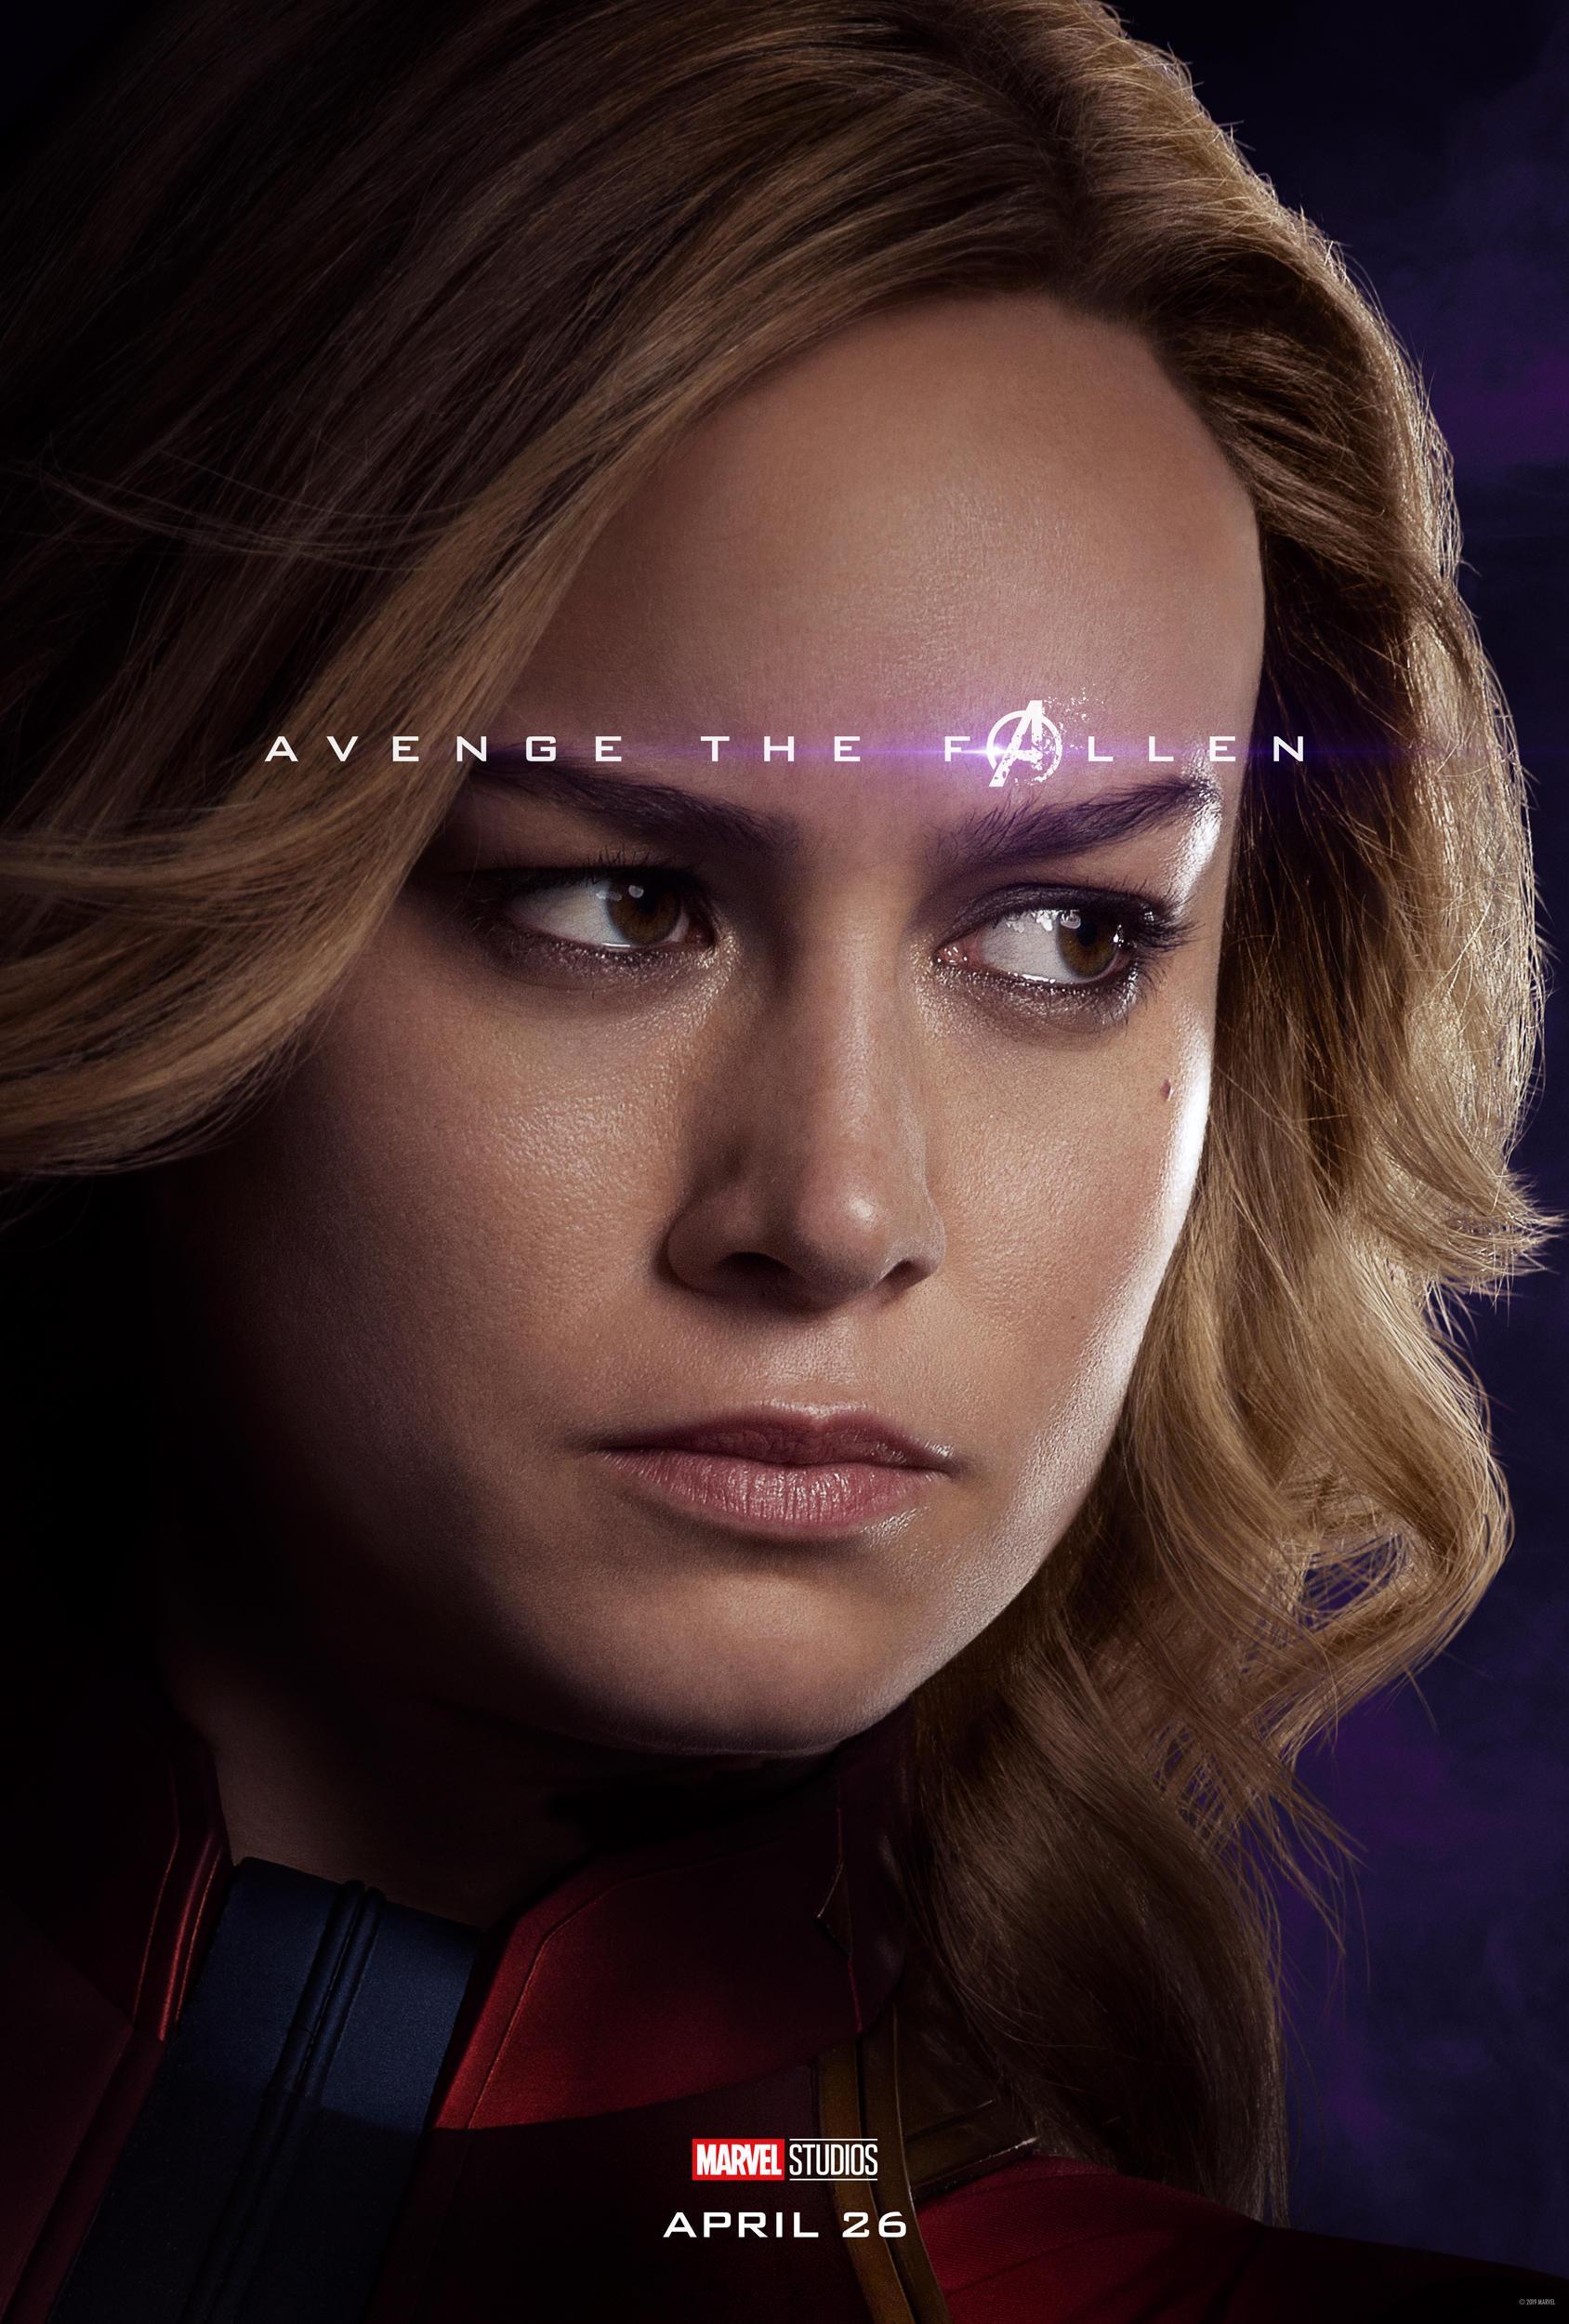 MCU recap ahead of Avengers: Endgame: What happens in every Marvel